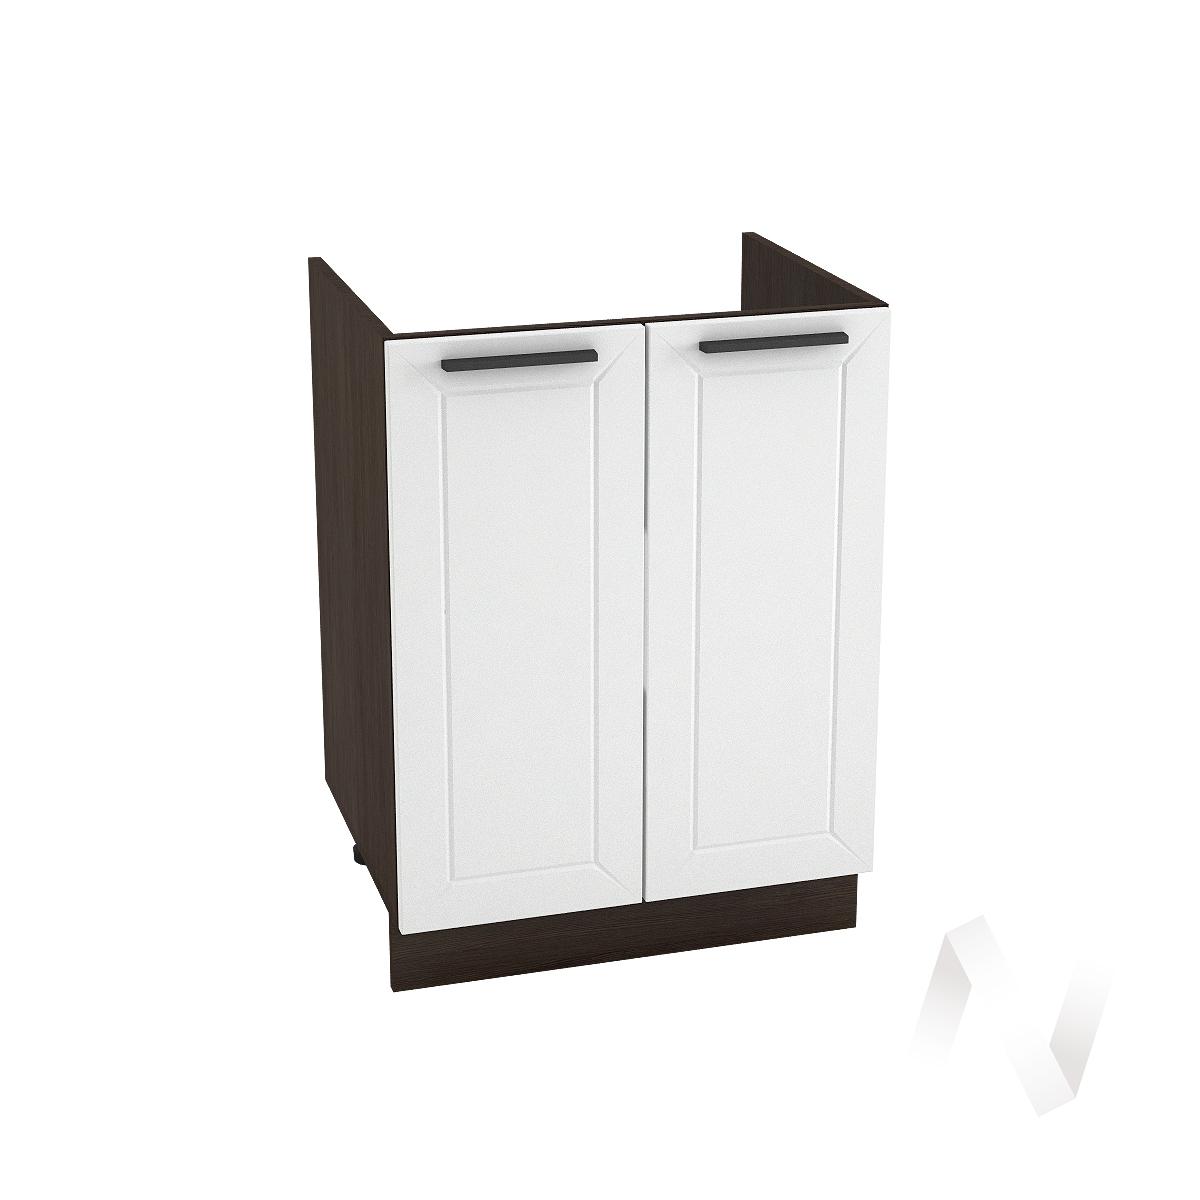 "Кухня ""Глетчер"": Шкаф нижний под мойку 600, ШНМ 600 (Айленд Силк/корпус венге)"